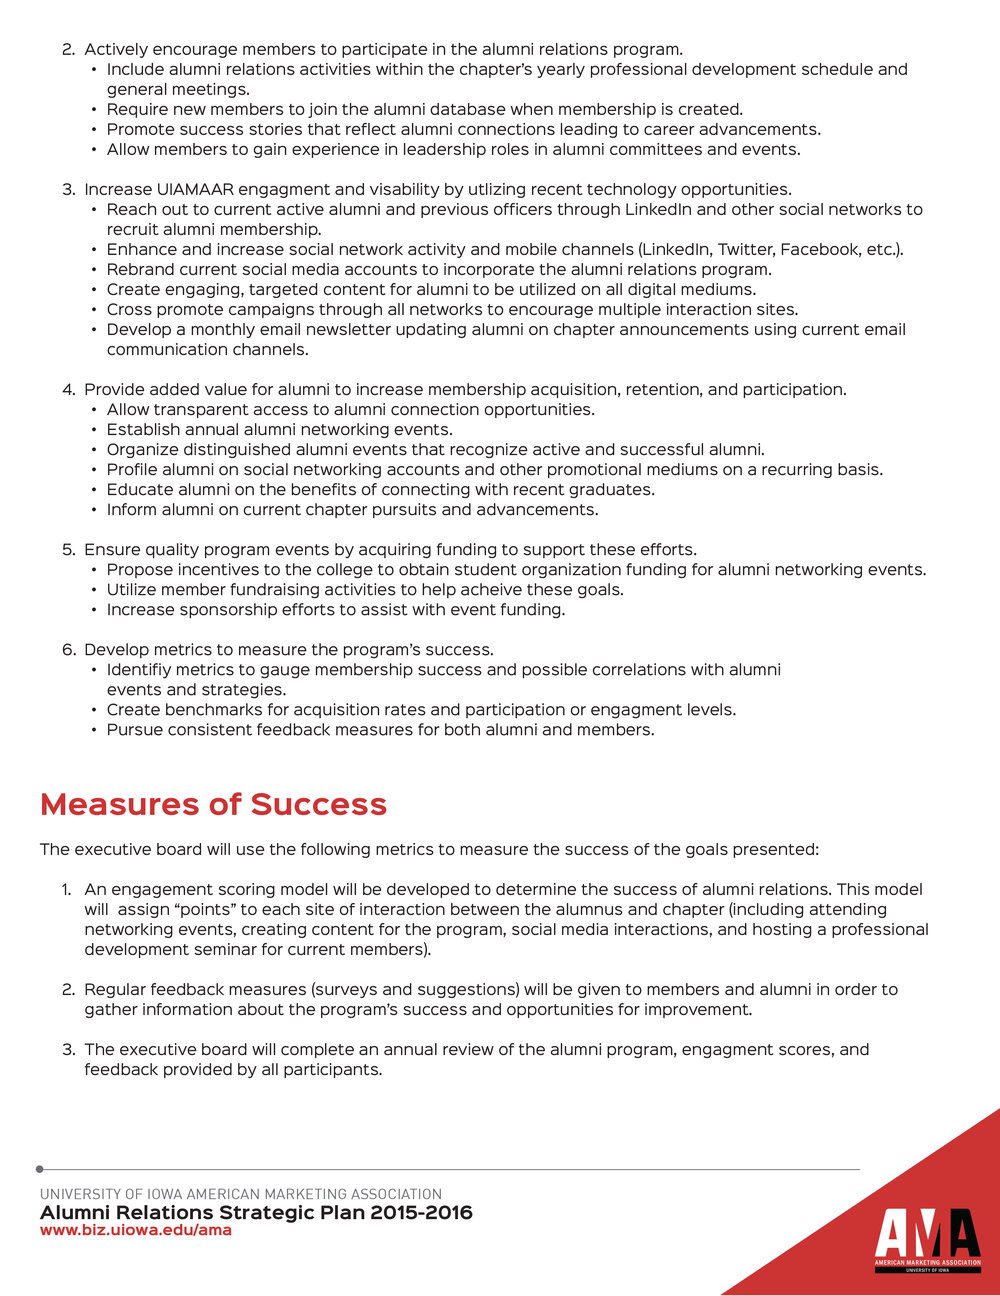 ama_alumnistrategicplan-5.jpg